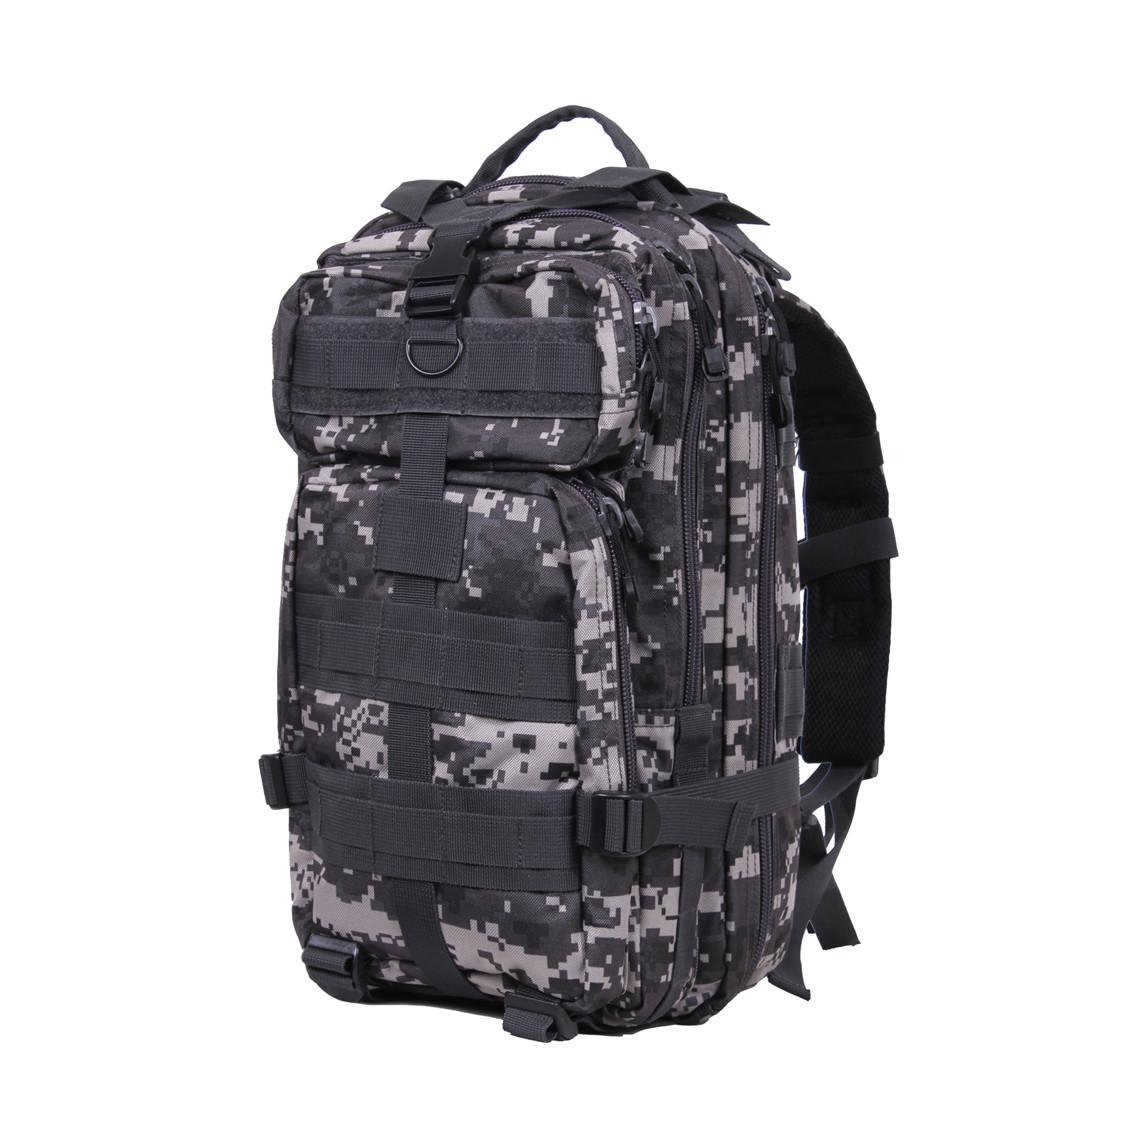 75a8428d33 Shop Kids Tactical Digital Camo Backpacks - Fatigues Army Navy